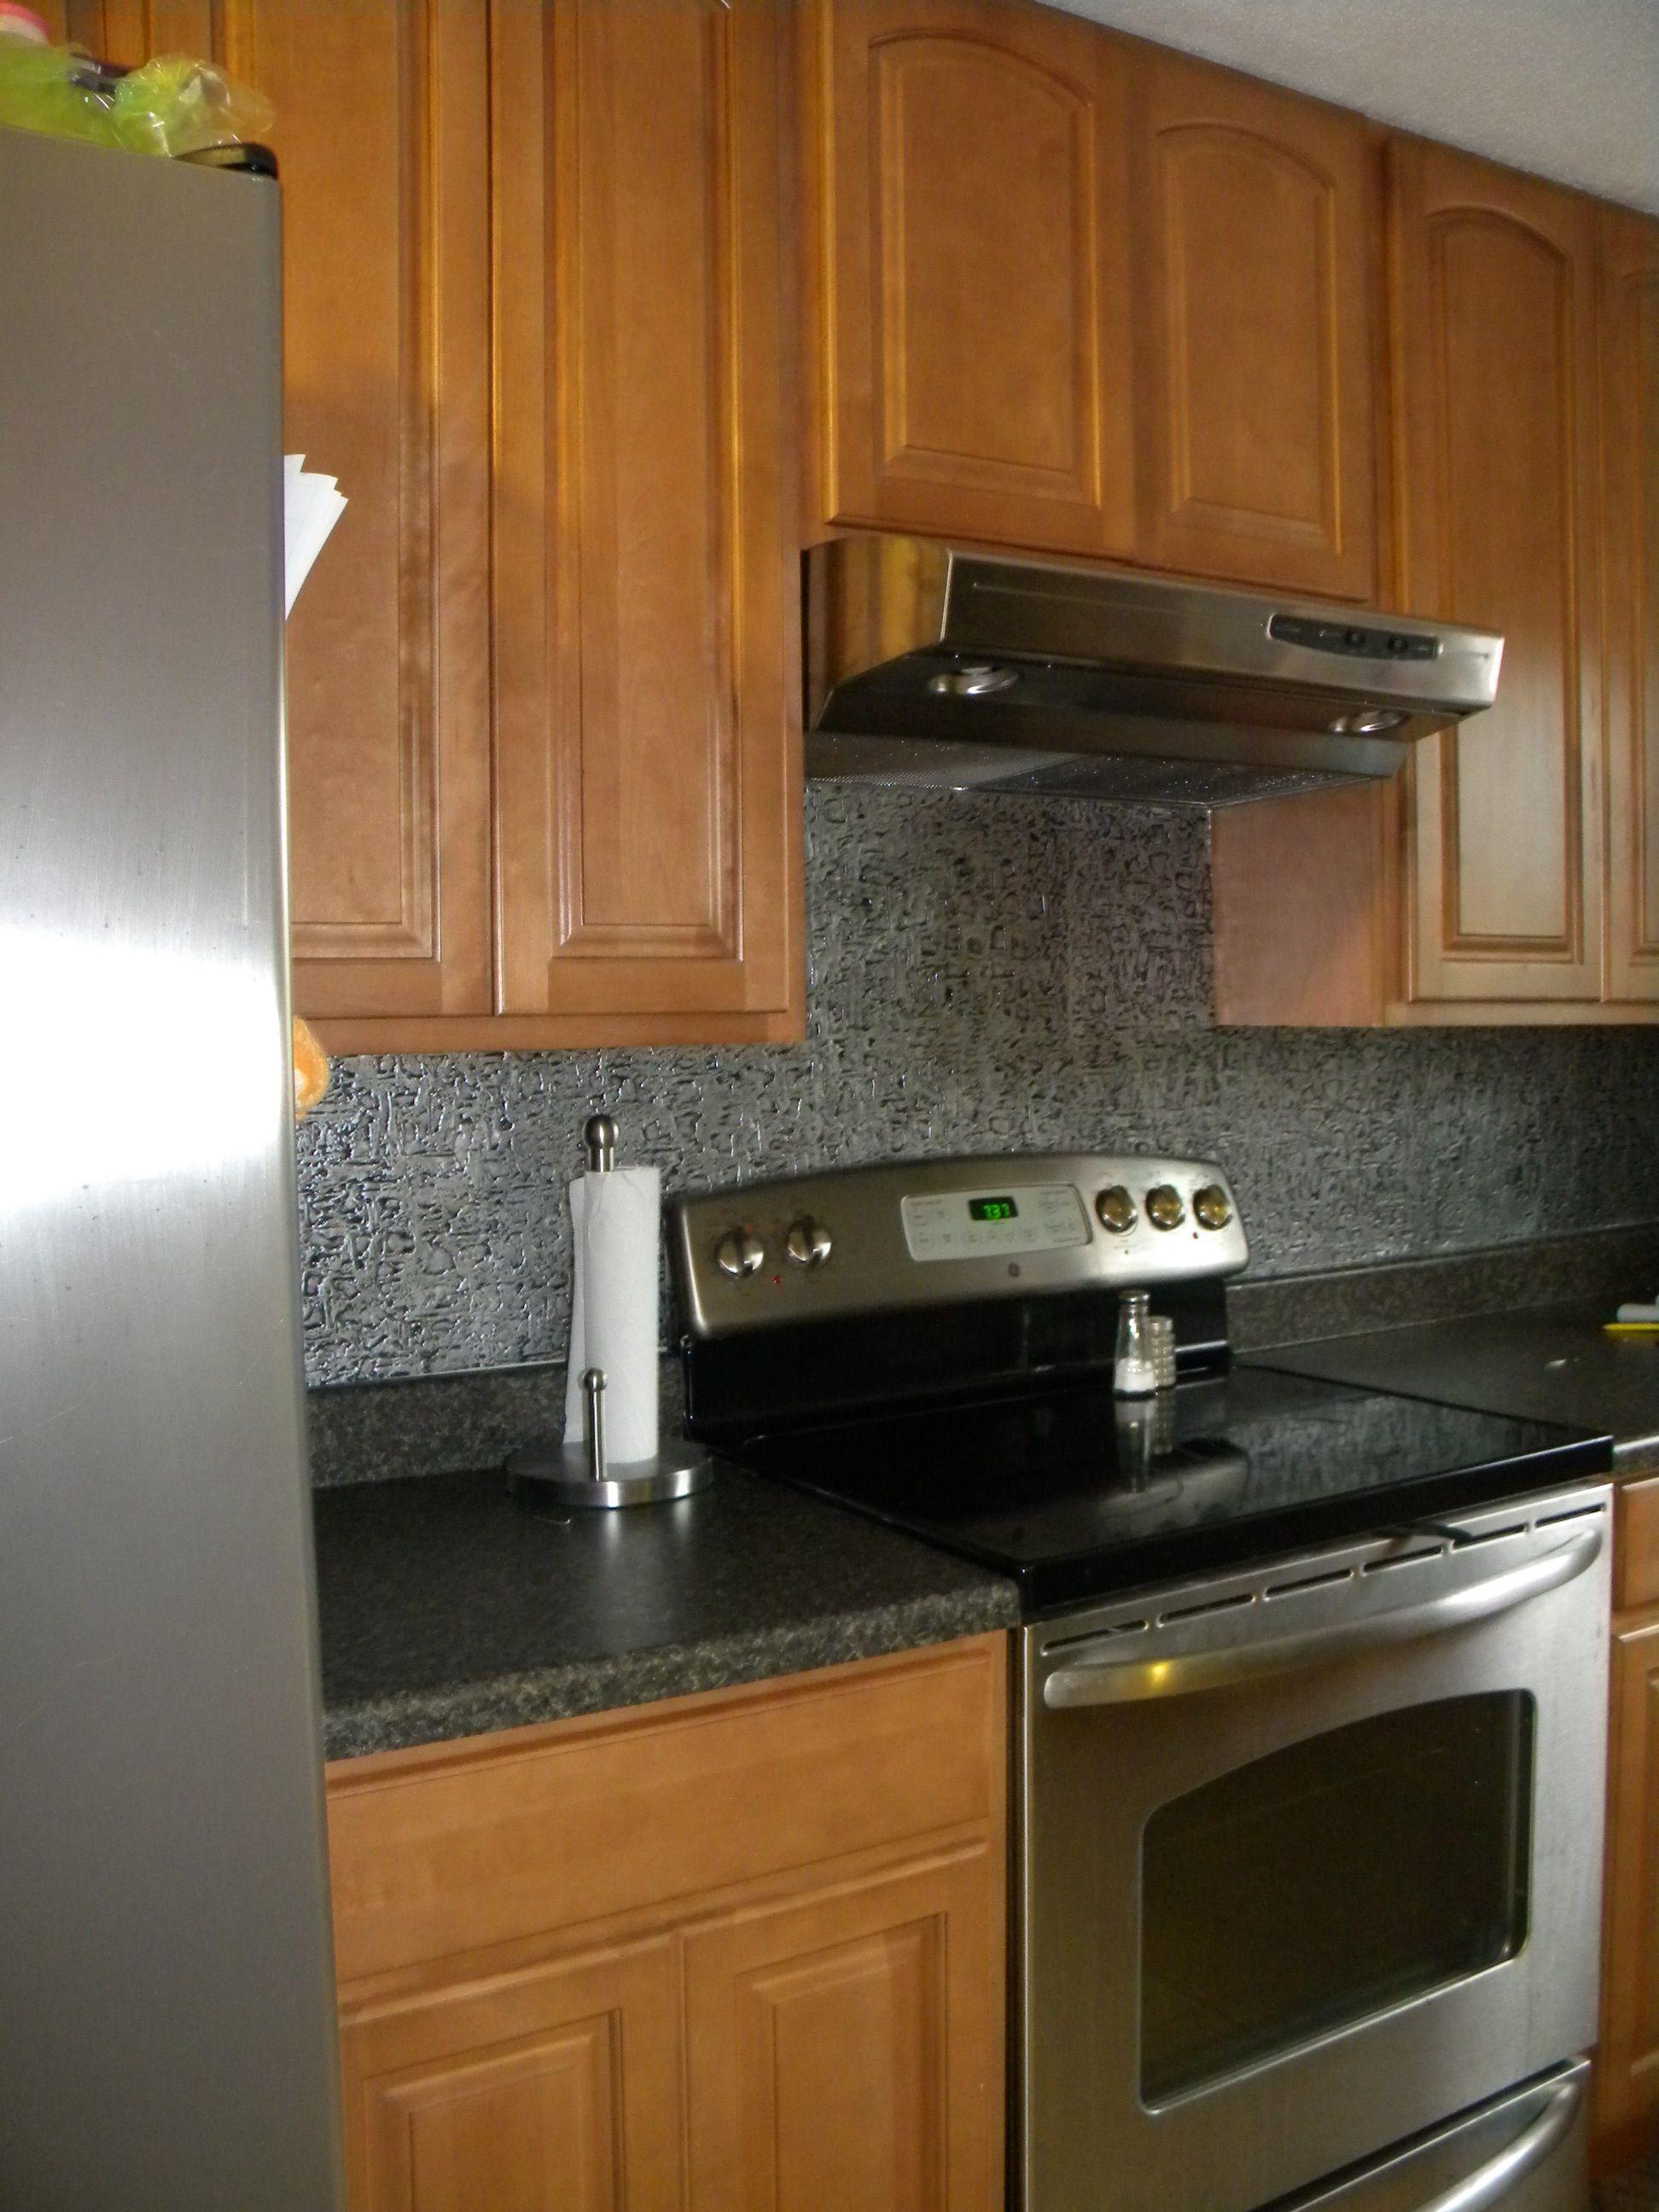 Kitchen decor countertop microwave copper kitchen decor apartment